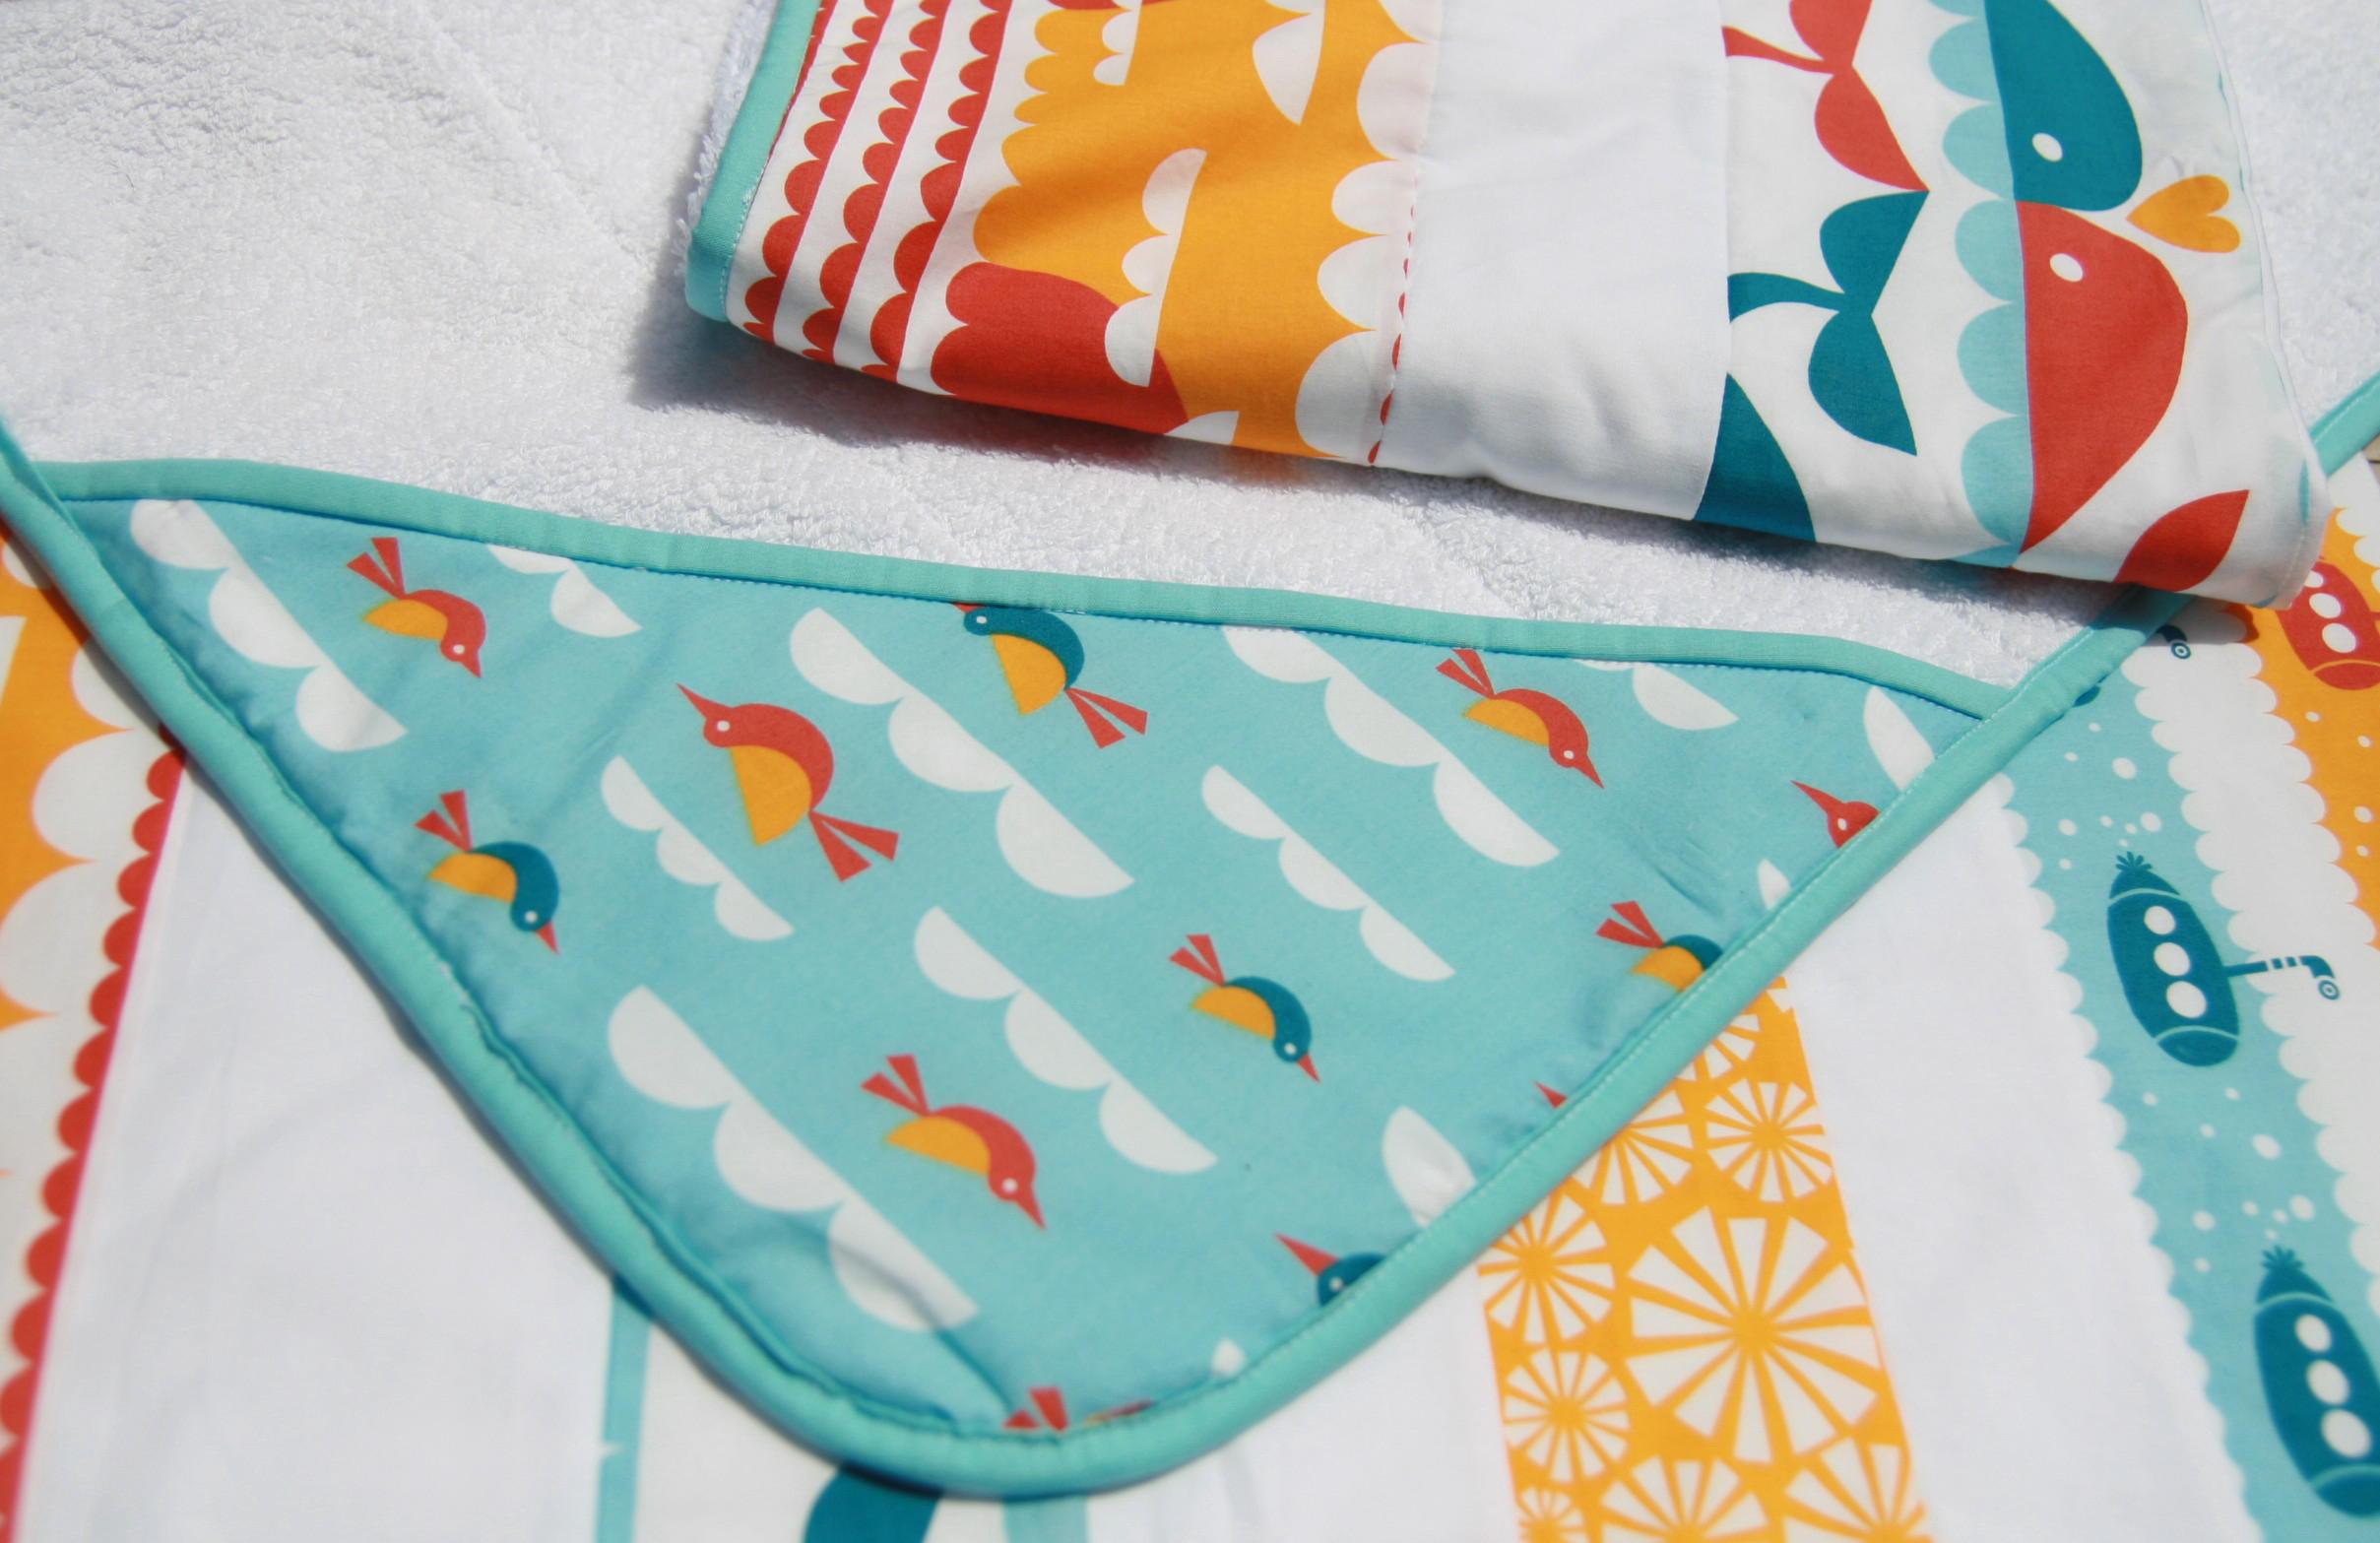 Arrullos de patchwork para bebé con capucha